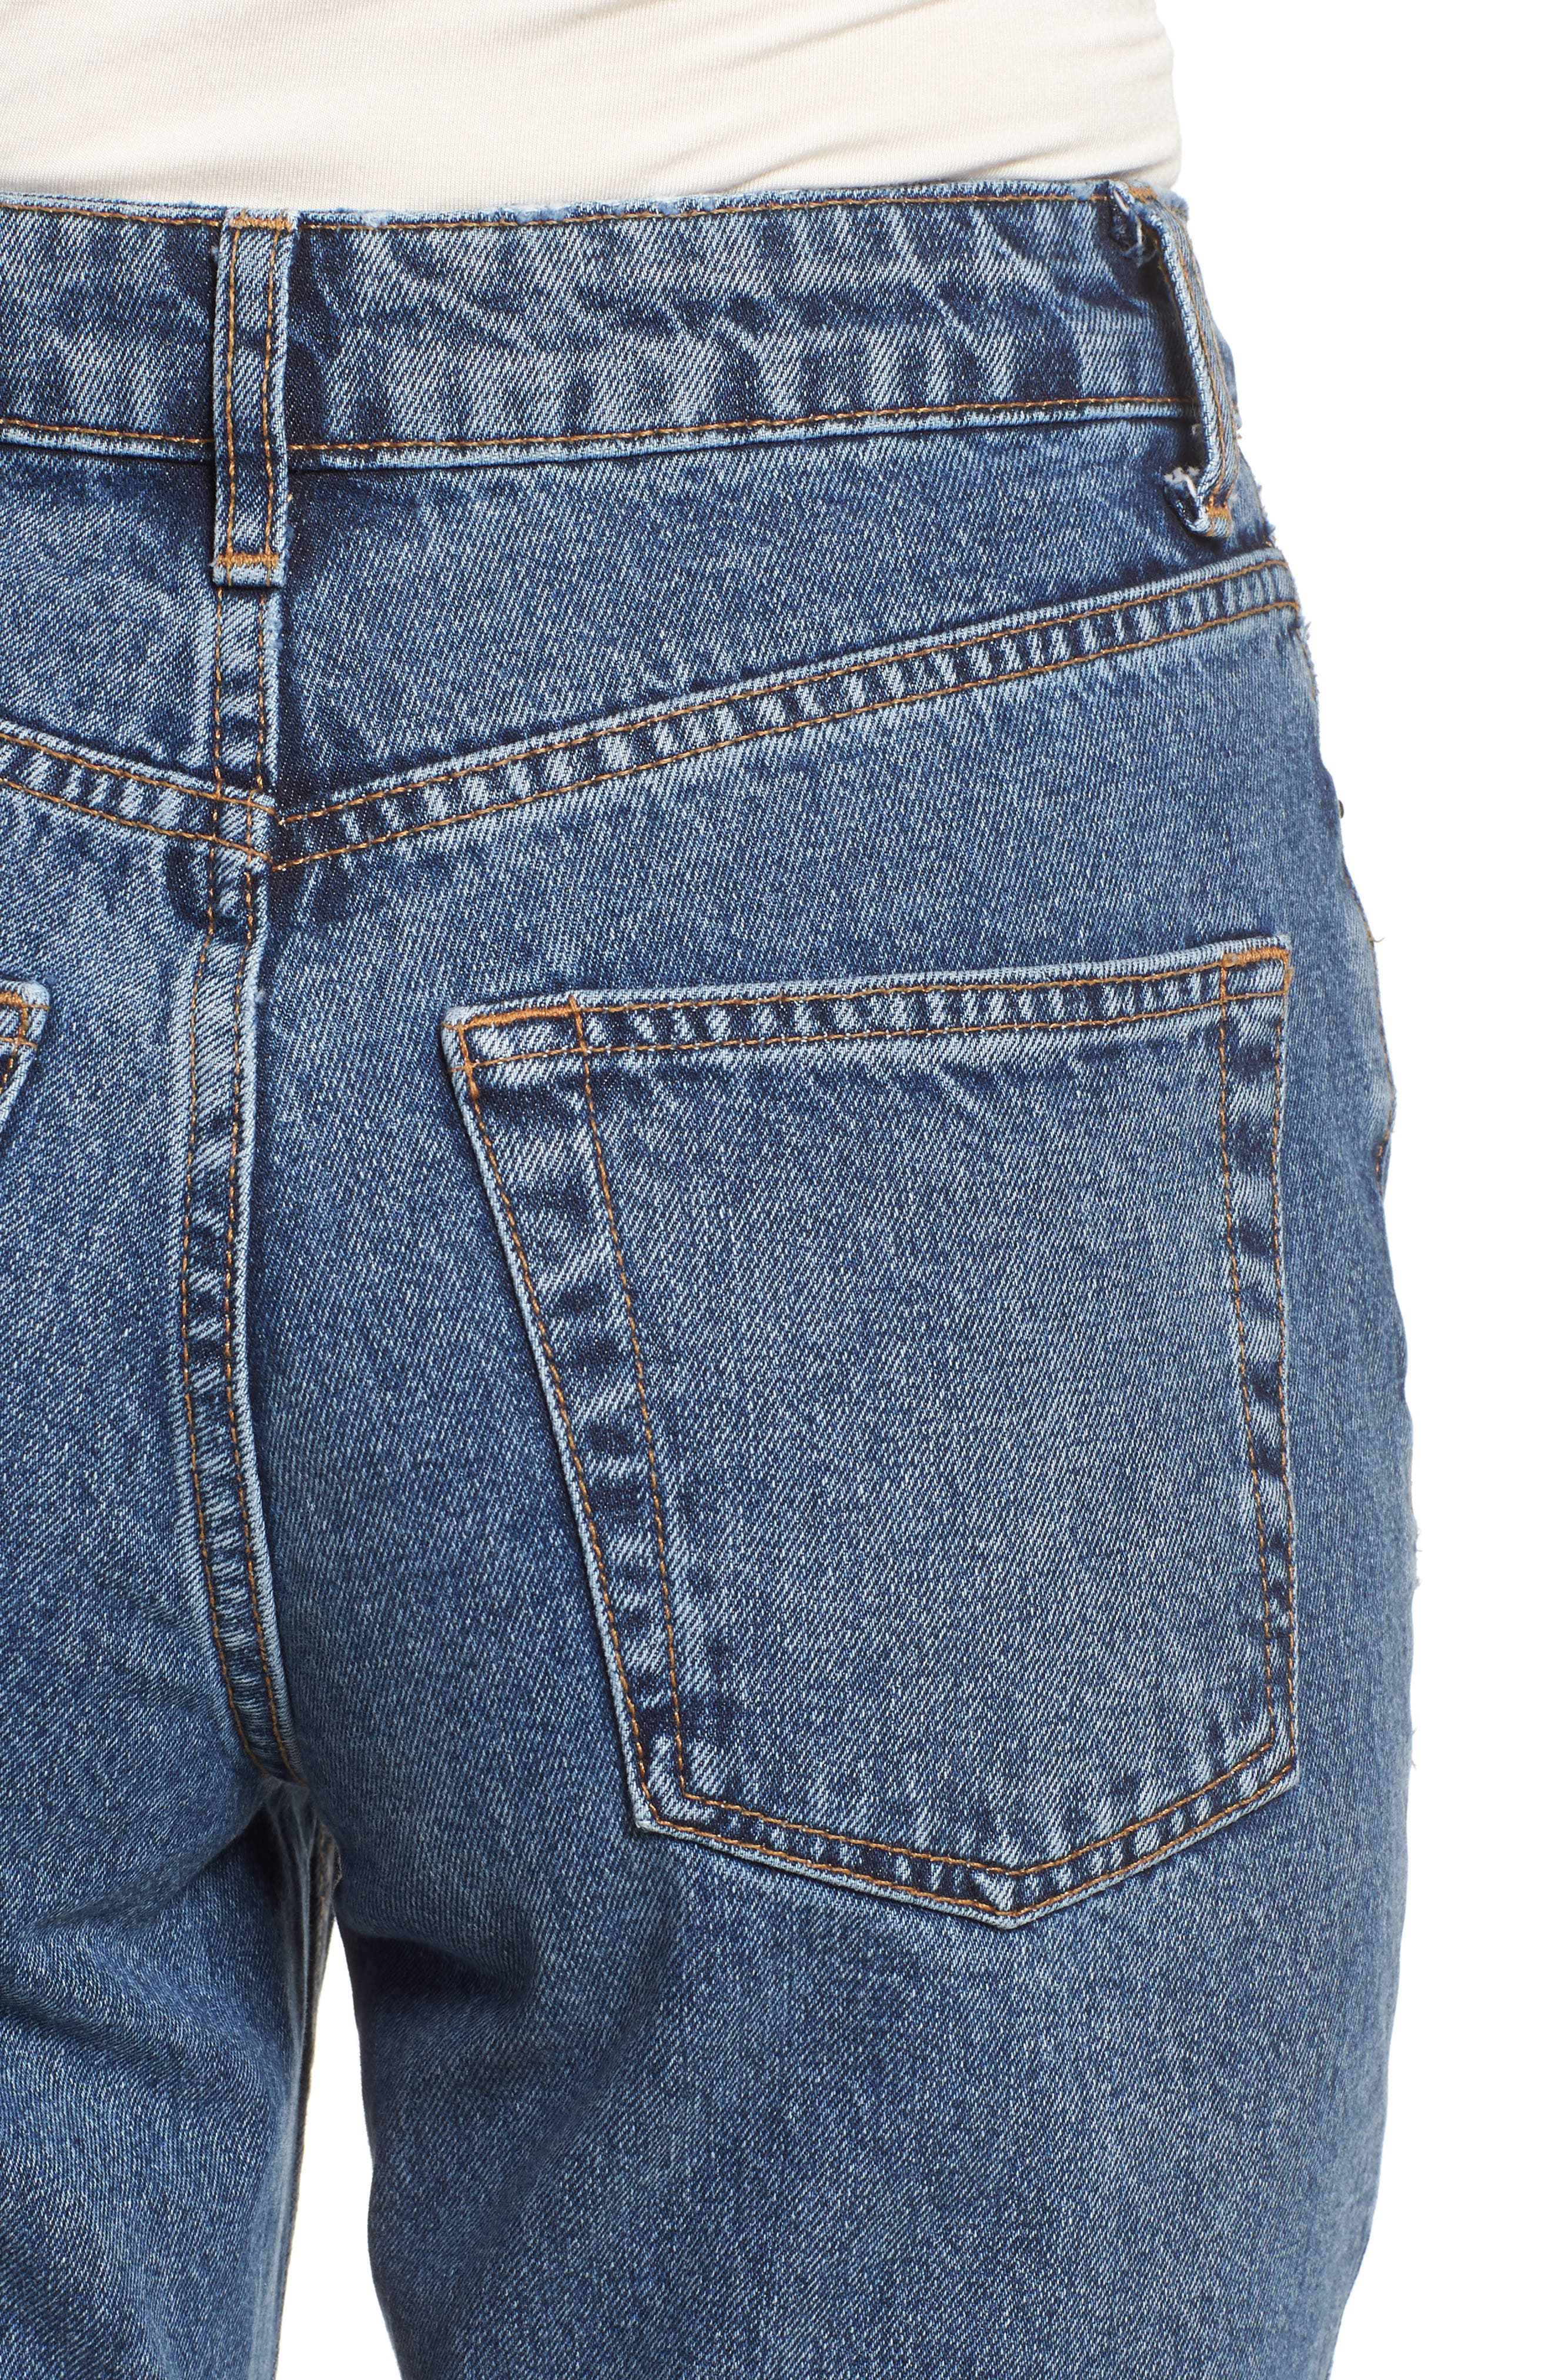 Petite Mid Denim Mom Jeans,                             Alternate thumbnail 4, color,                             MID DENIM